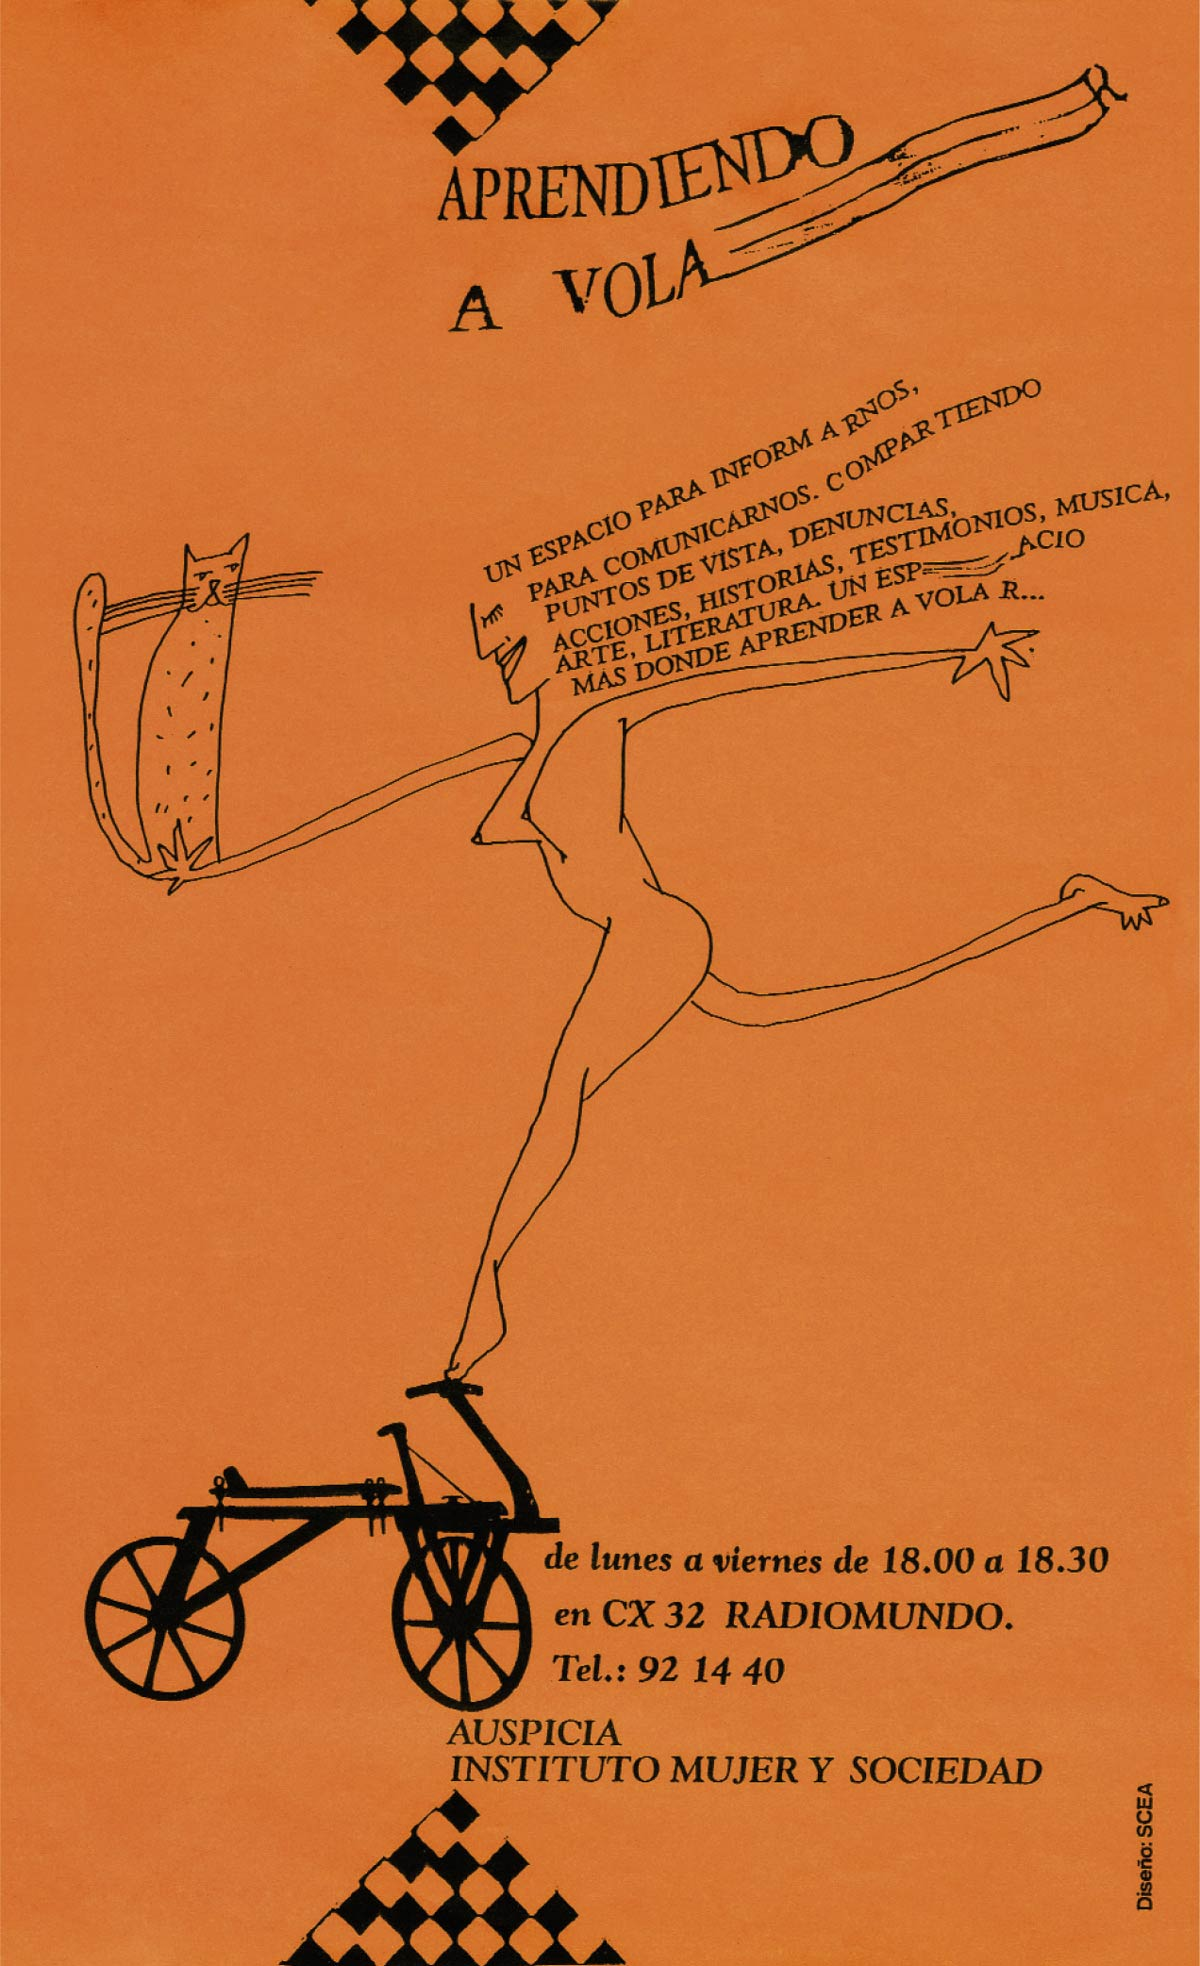 Slanted-1200px-Programa-de-Radio-✺-Radio-Show-✺-Maca-✺-1992